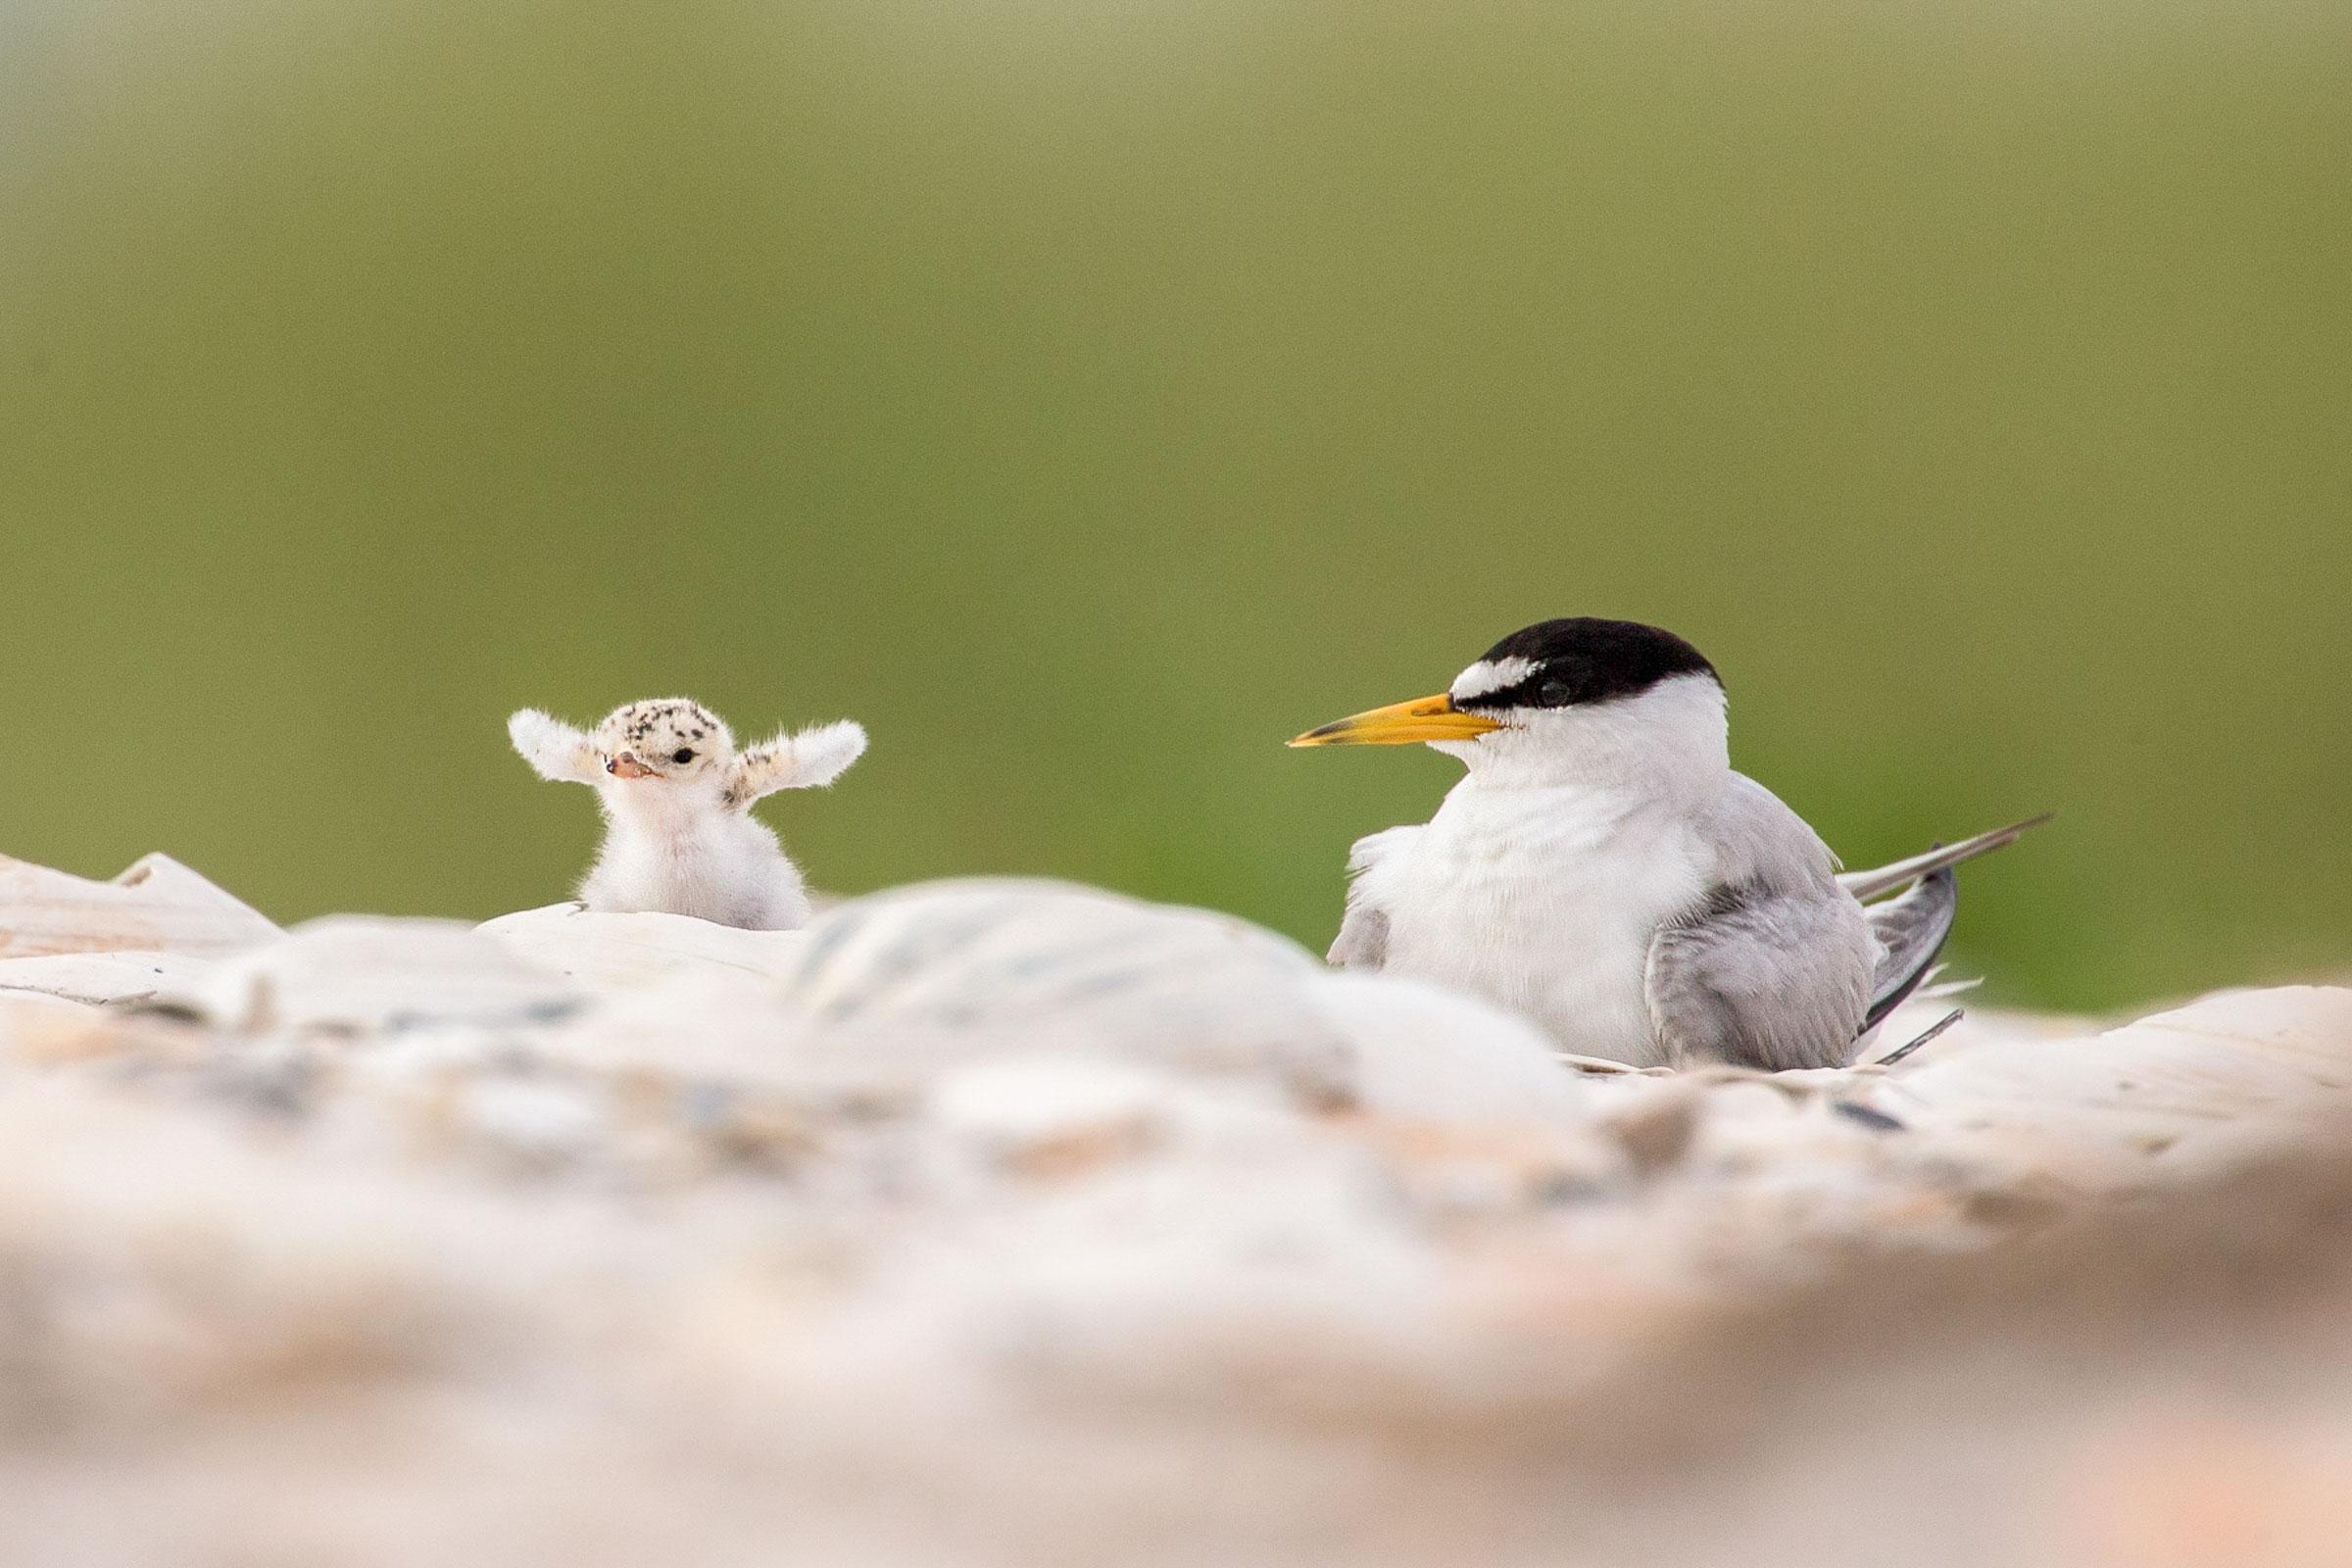 Least Tern and chick. Melissa Groo/Audubon Photography Awards